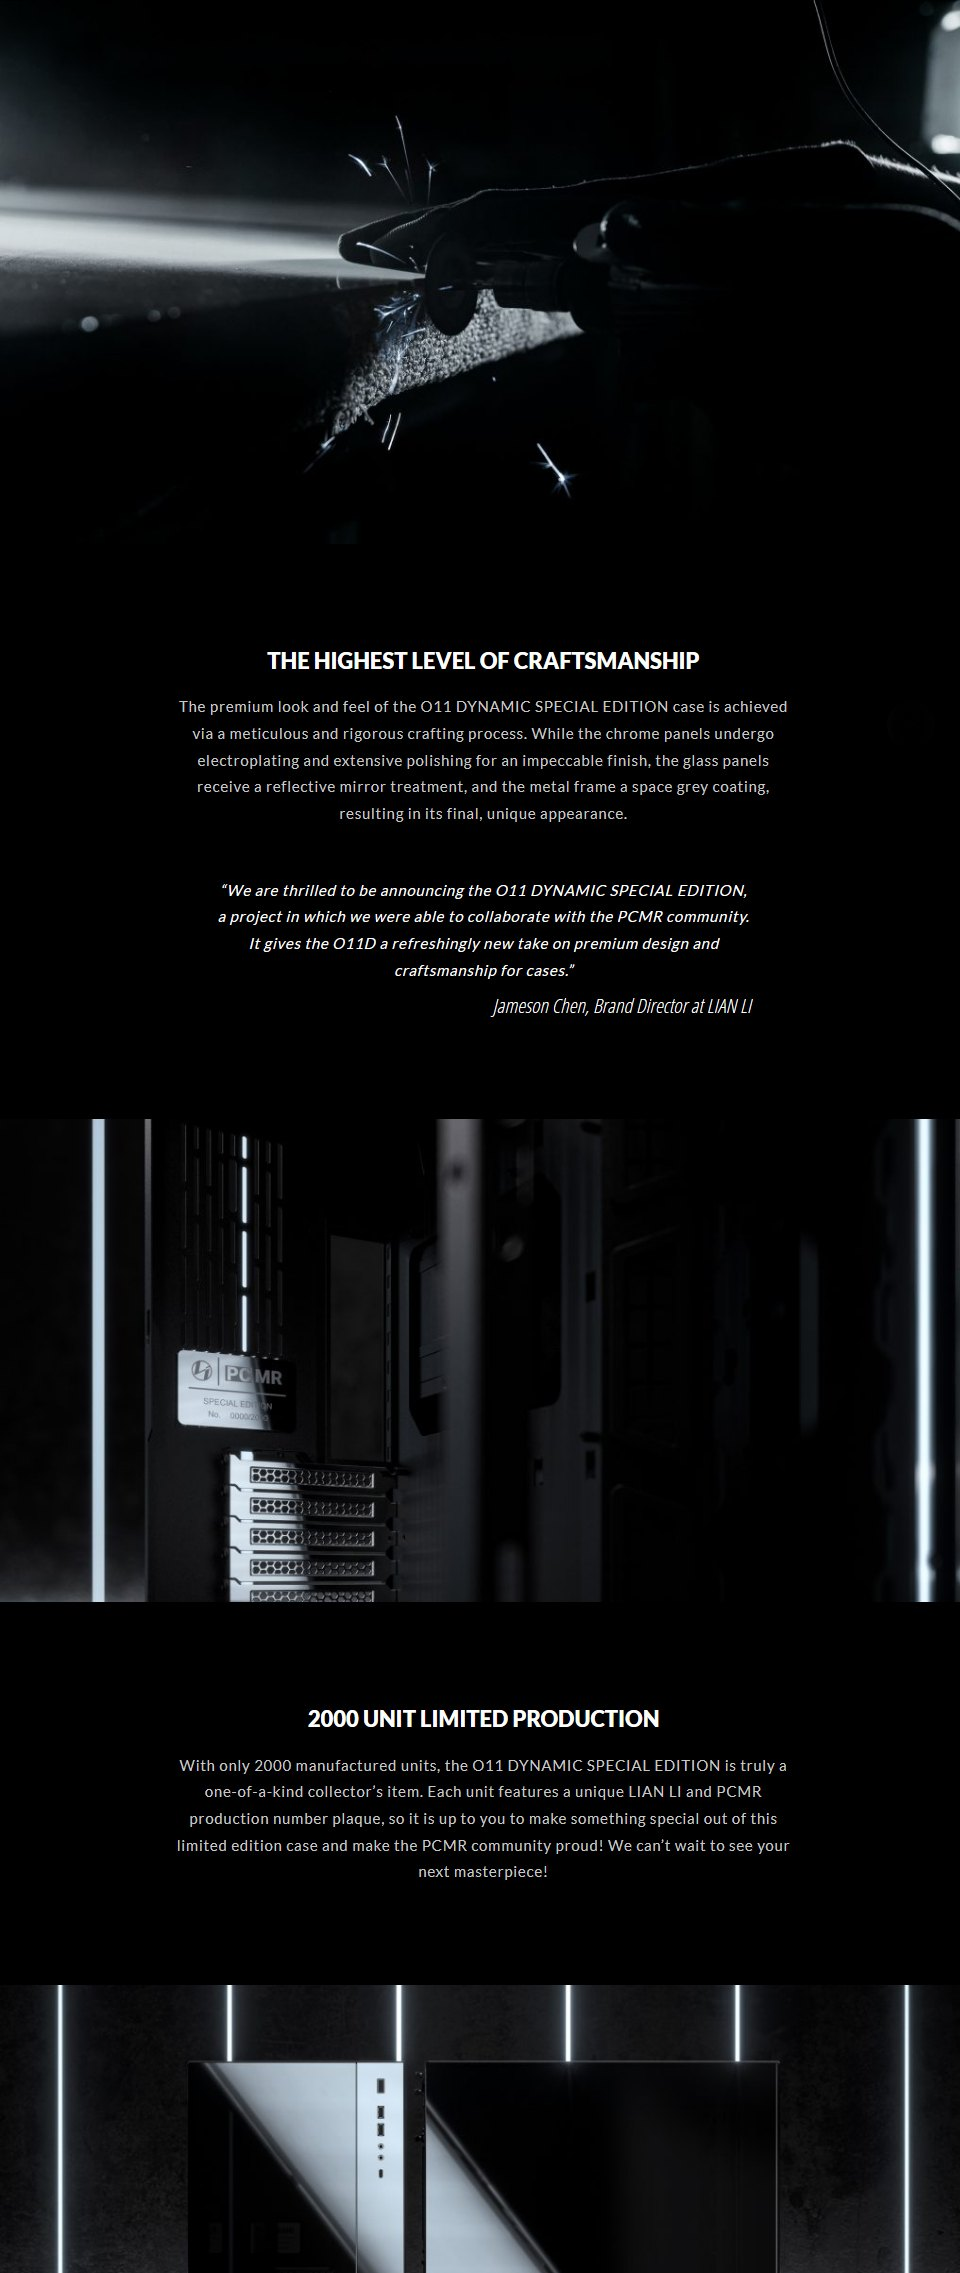 Lian Li PC-O11 Dynamic XL PCMR Limited Edition Case features 2